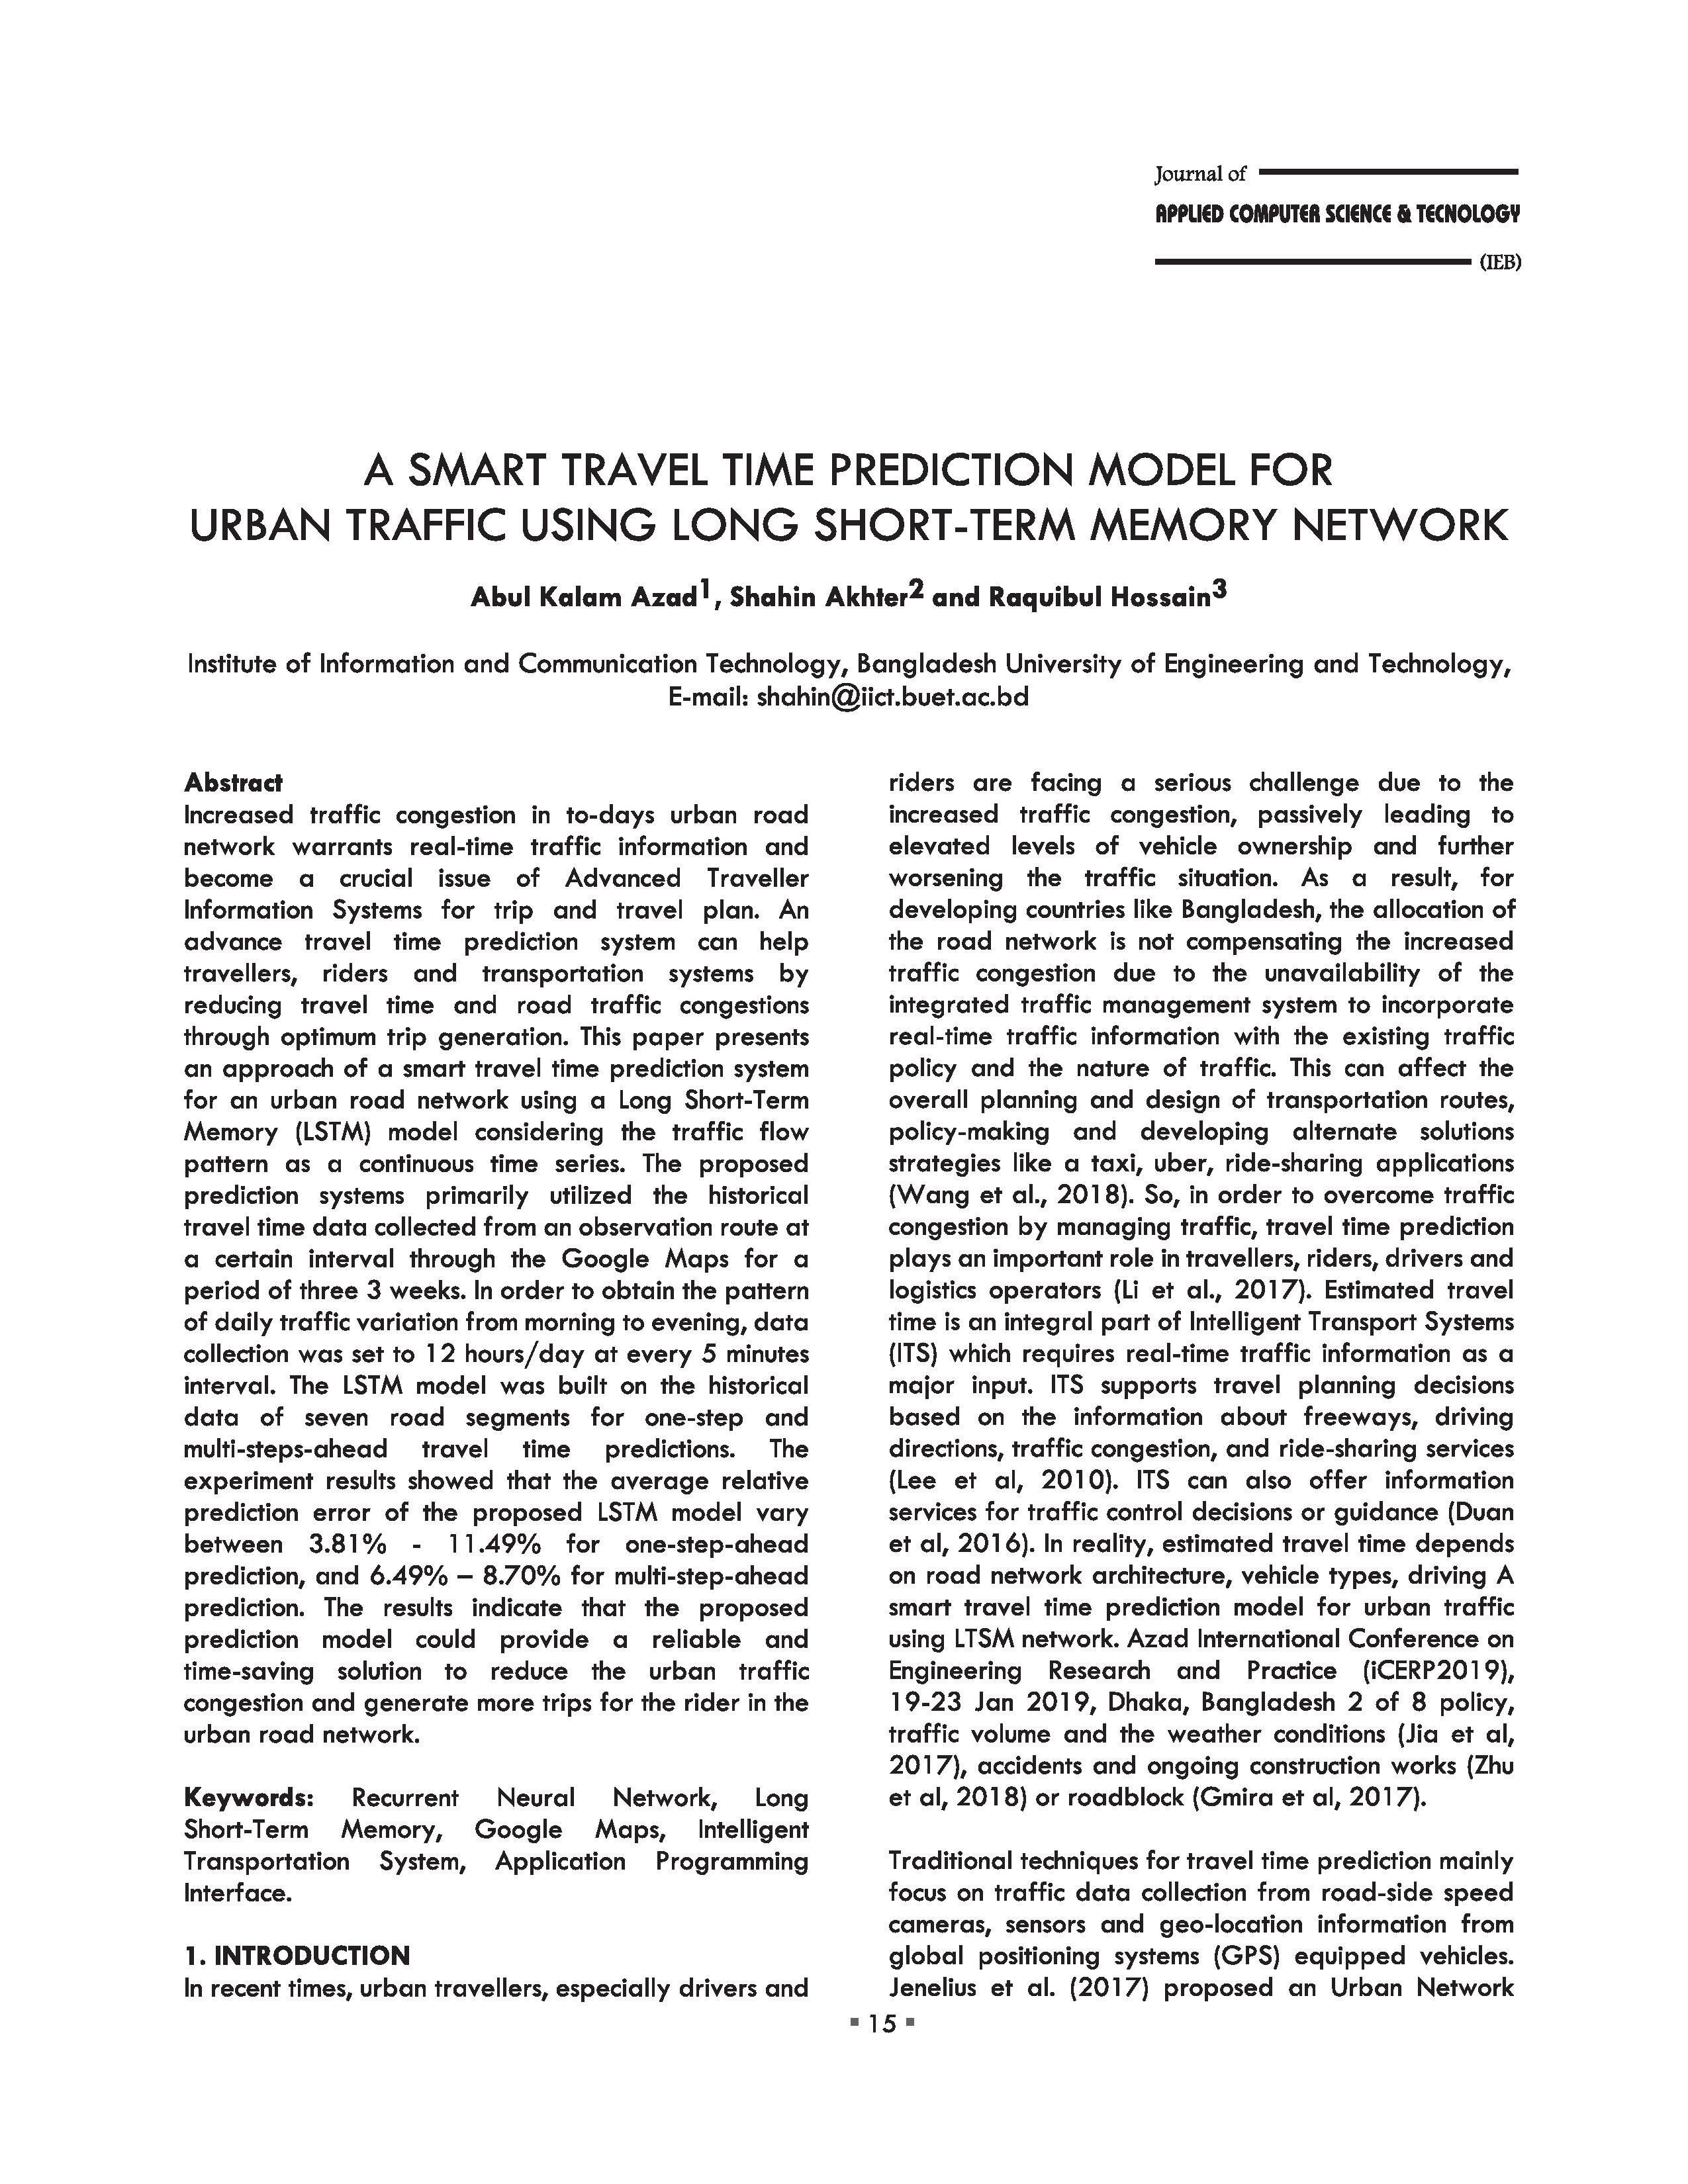 A SMART TRAVEL TIME PREDICTION MODEL FOR URBAN TRAFFIC USING LONG SHORT-TERM MEMORY NETWORK